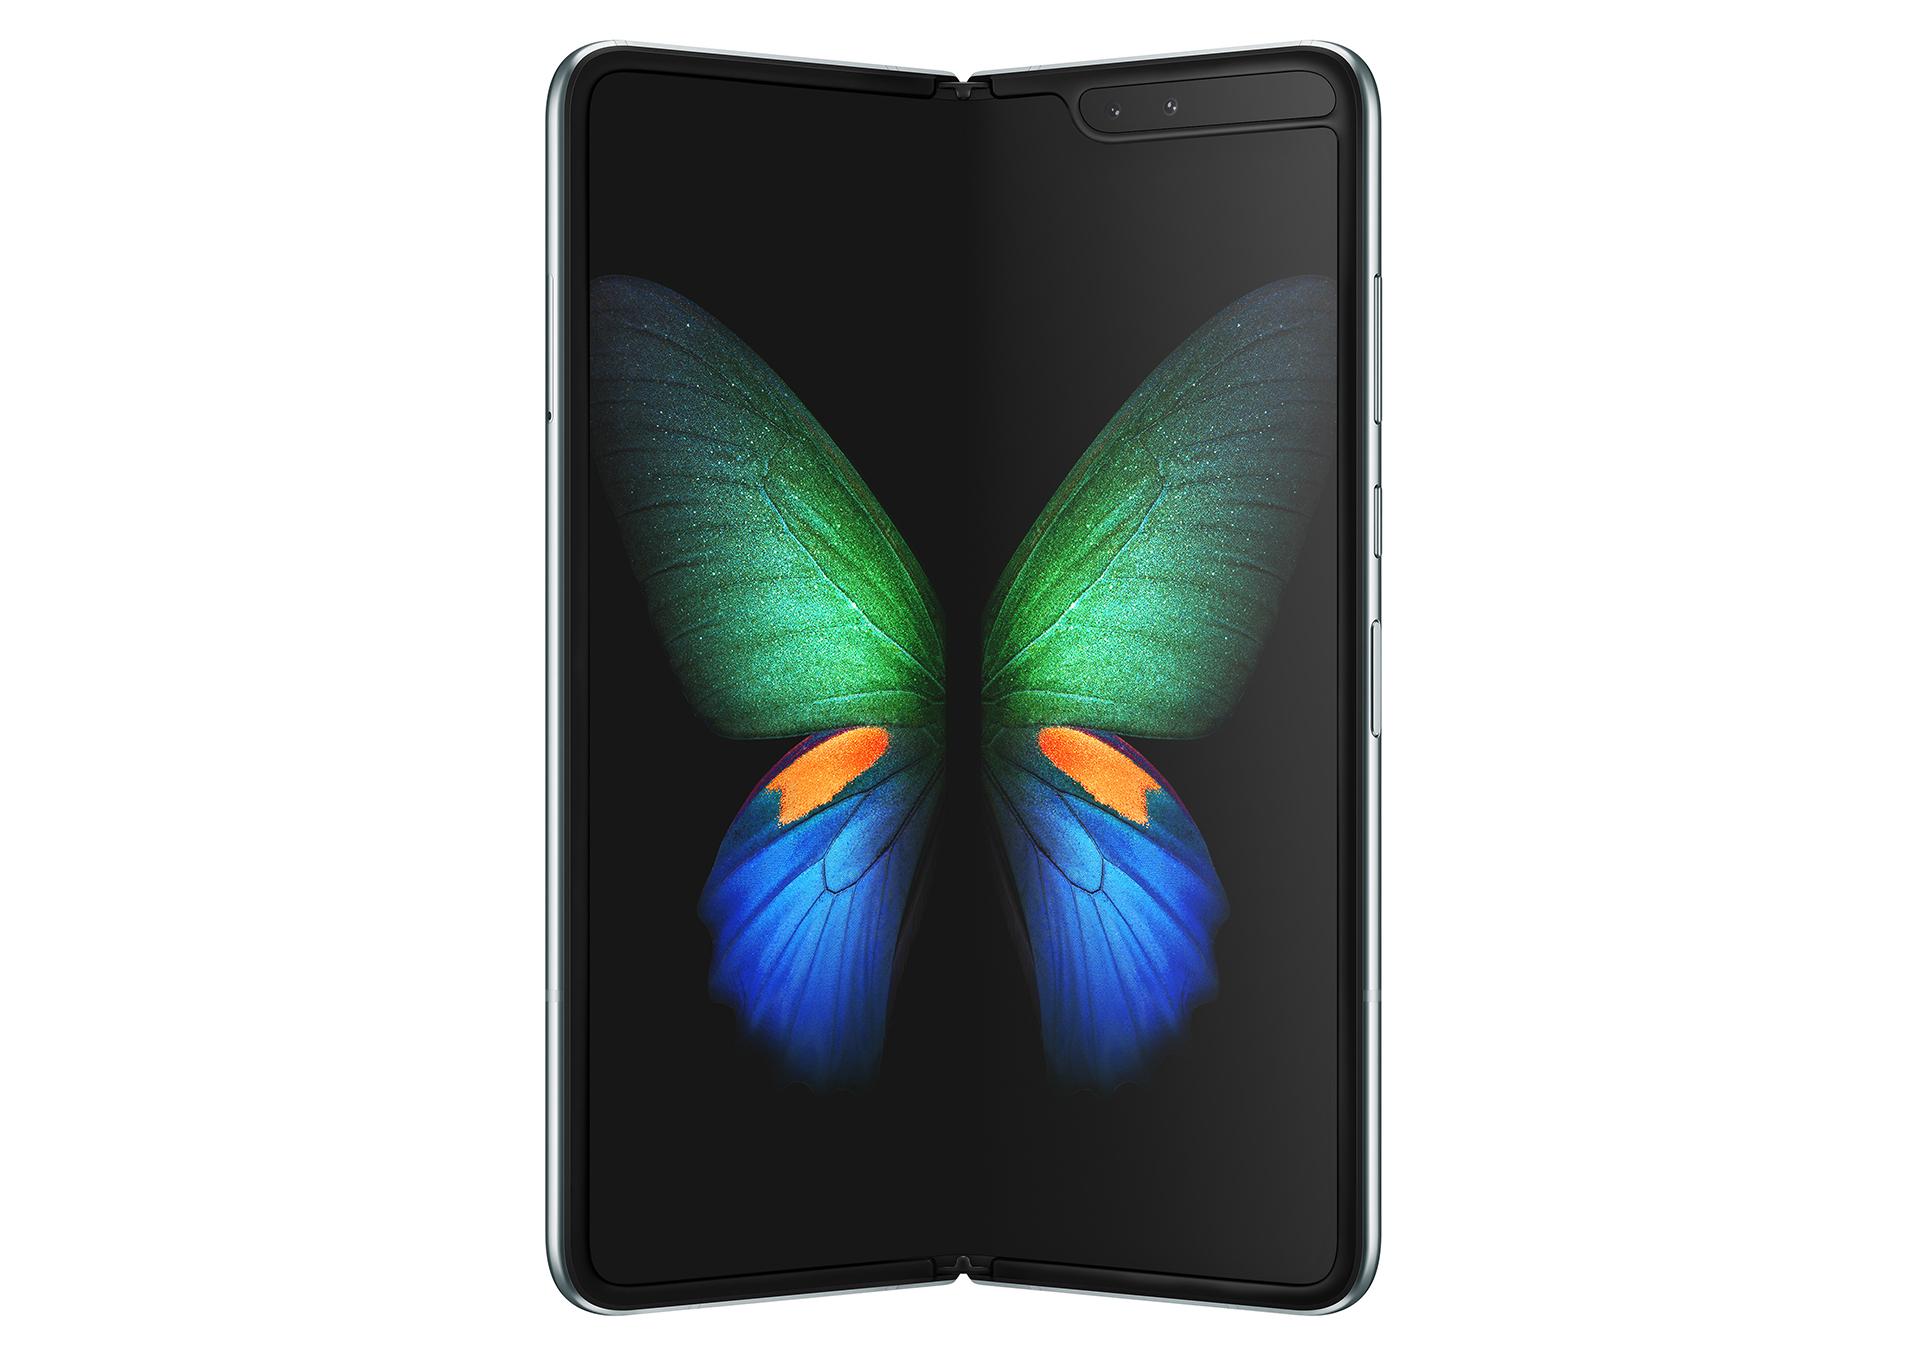 Marktstart des Galaxy Fold beginnt im September 2019